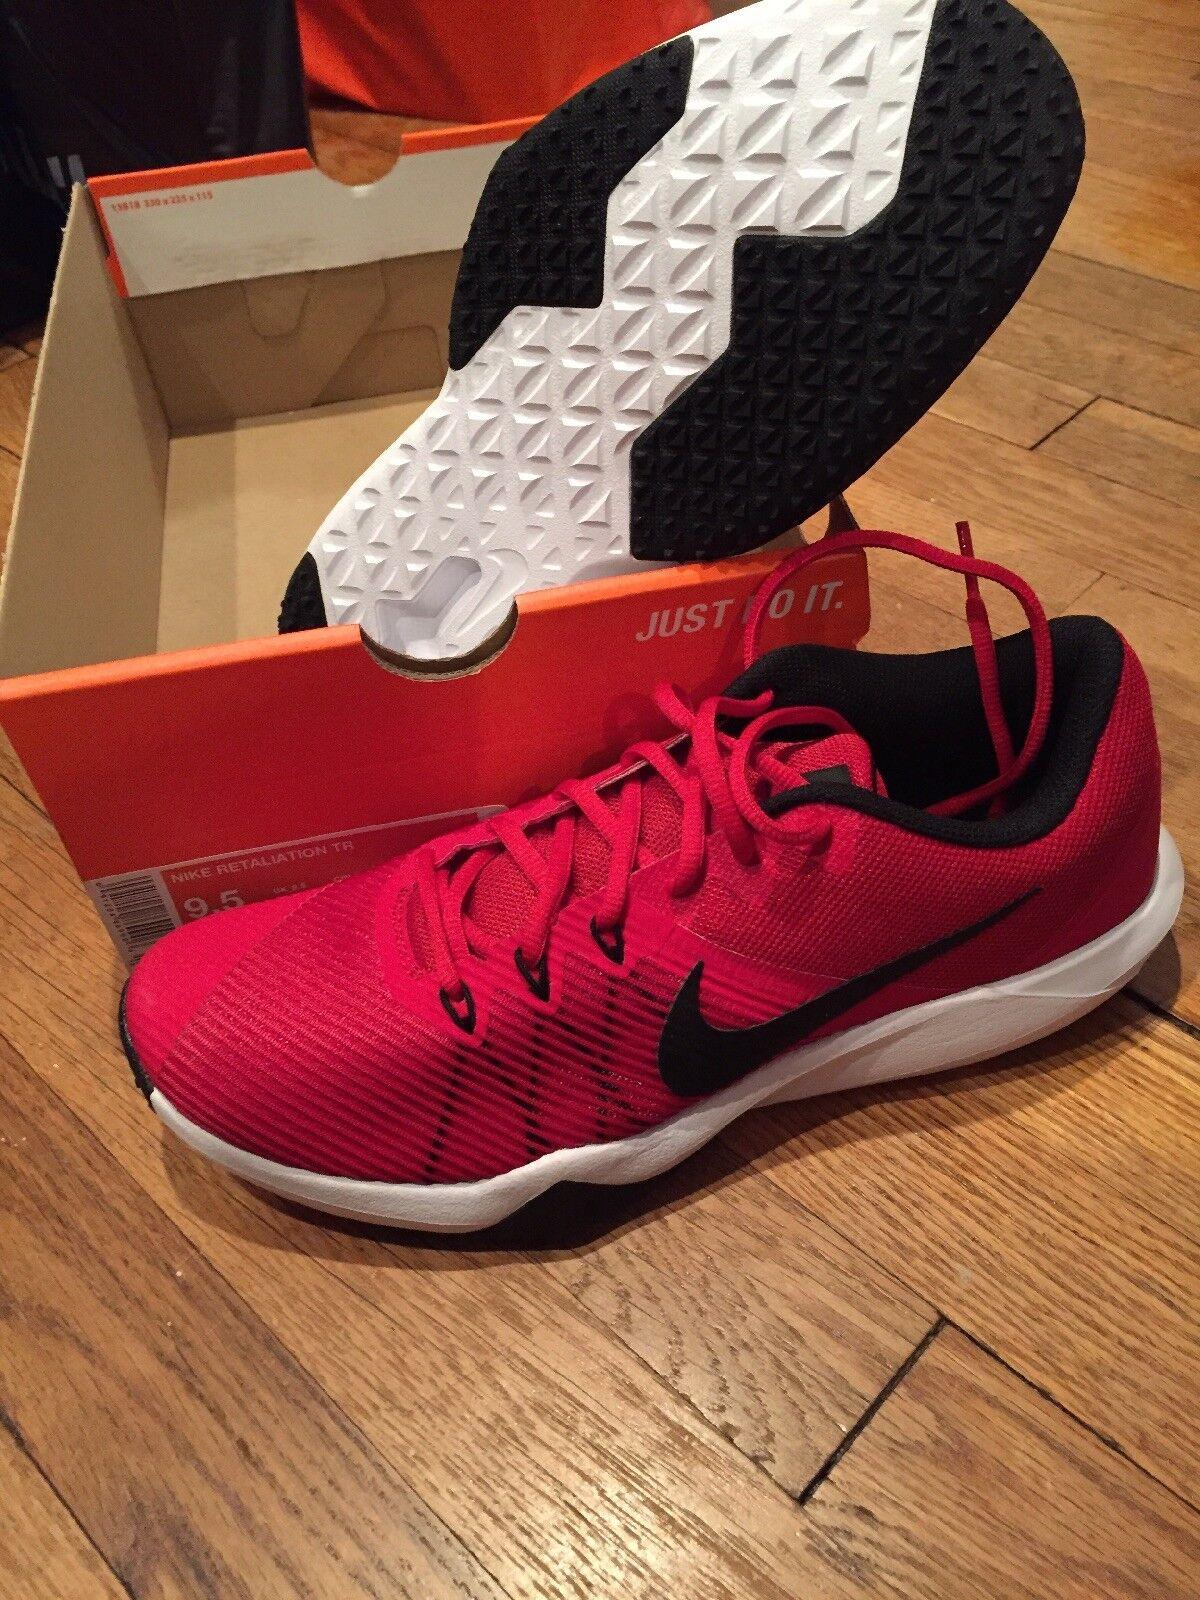 3086d7549a4 Nike Retaliation TR 917707-660 Gym Red Black White Men's Training Gym shoes  NEW noeqks4187-Athletic Shoes